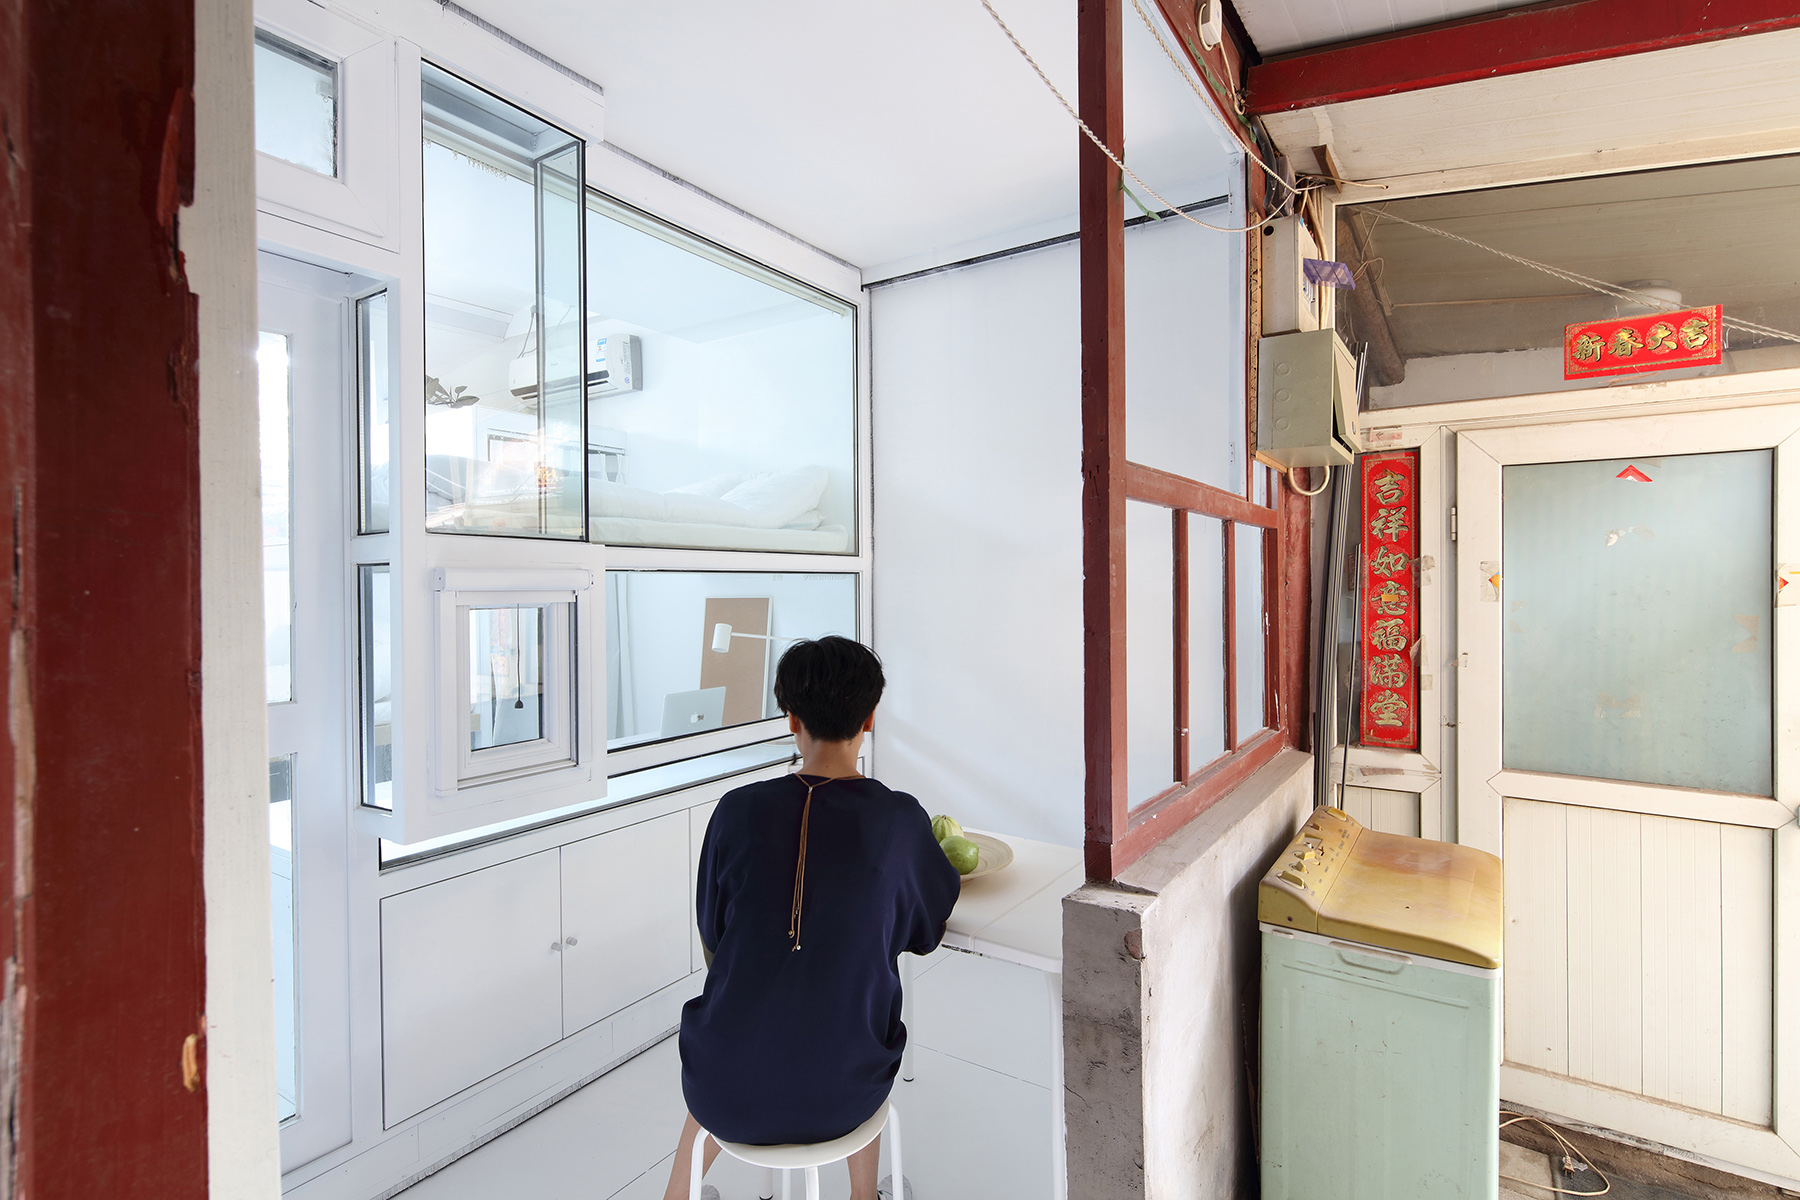 Caopu-humble-hostel-hisheji (13)